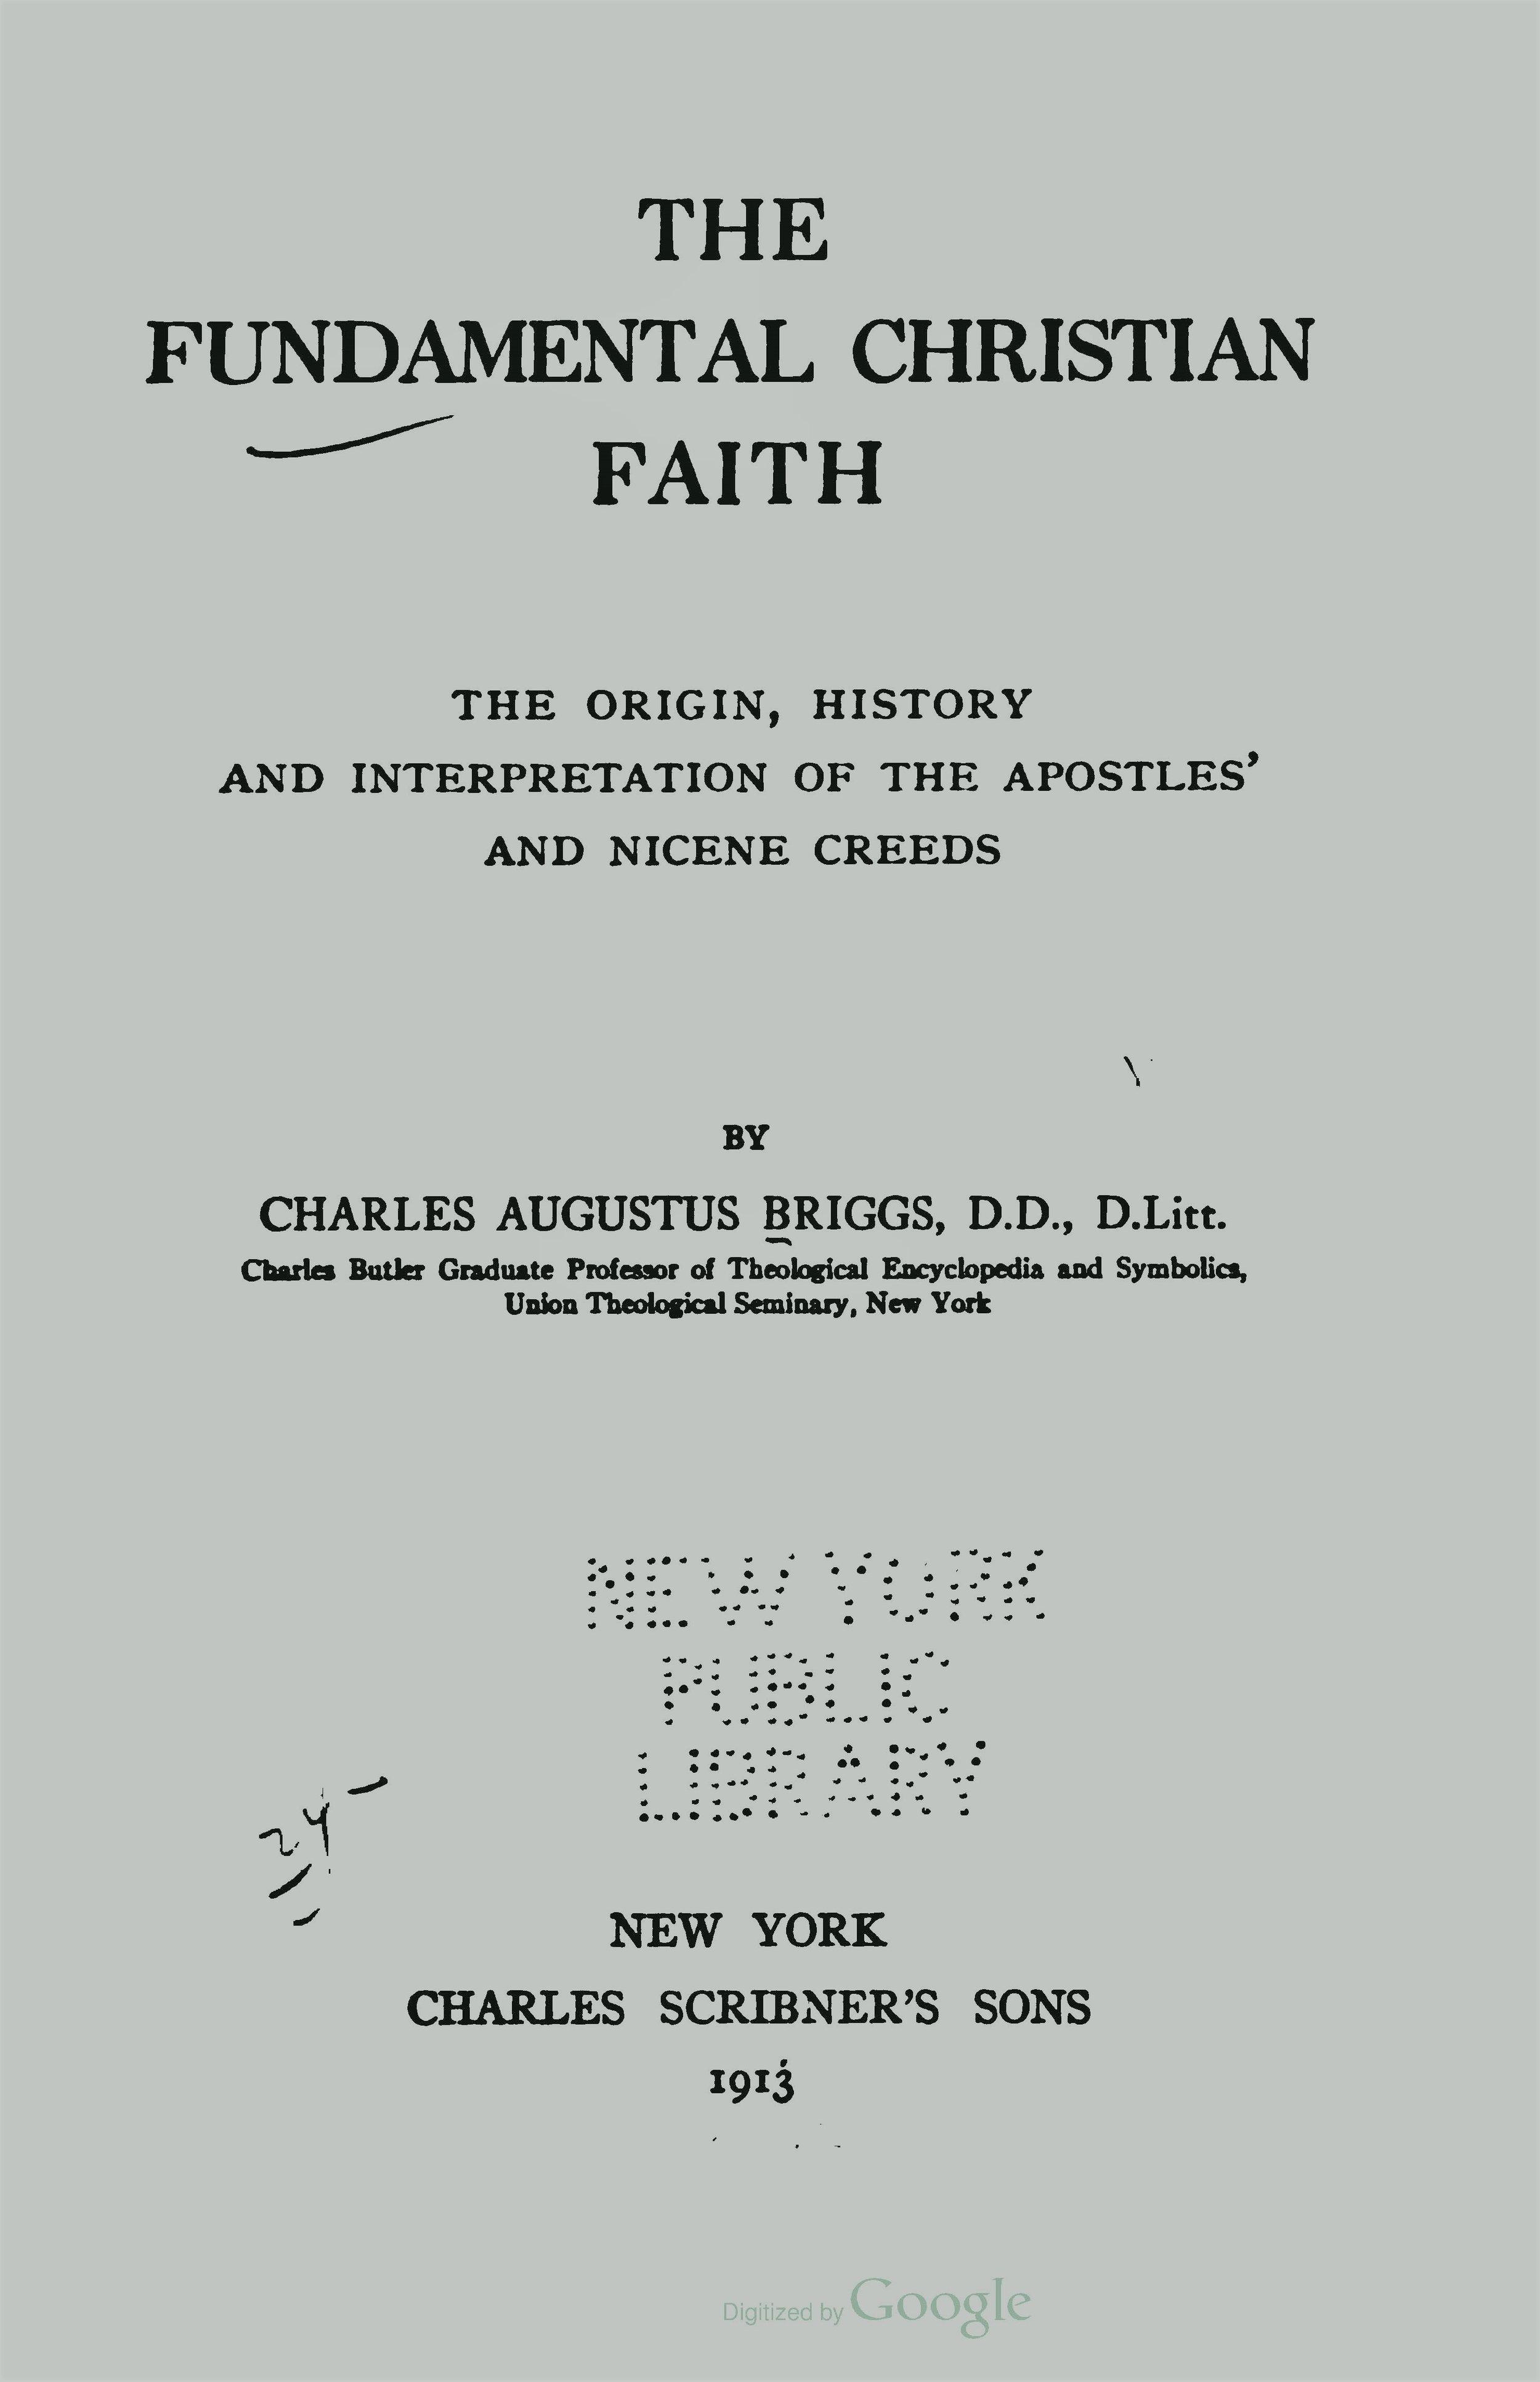 Briggs, Charles Augustus, The Fundamental Christian Faith Title Page.jpg